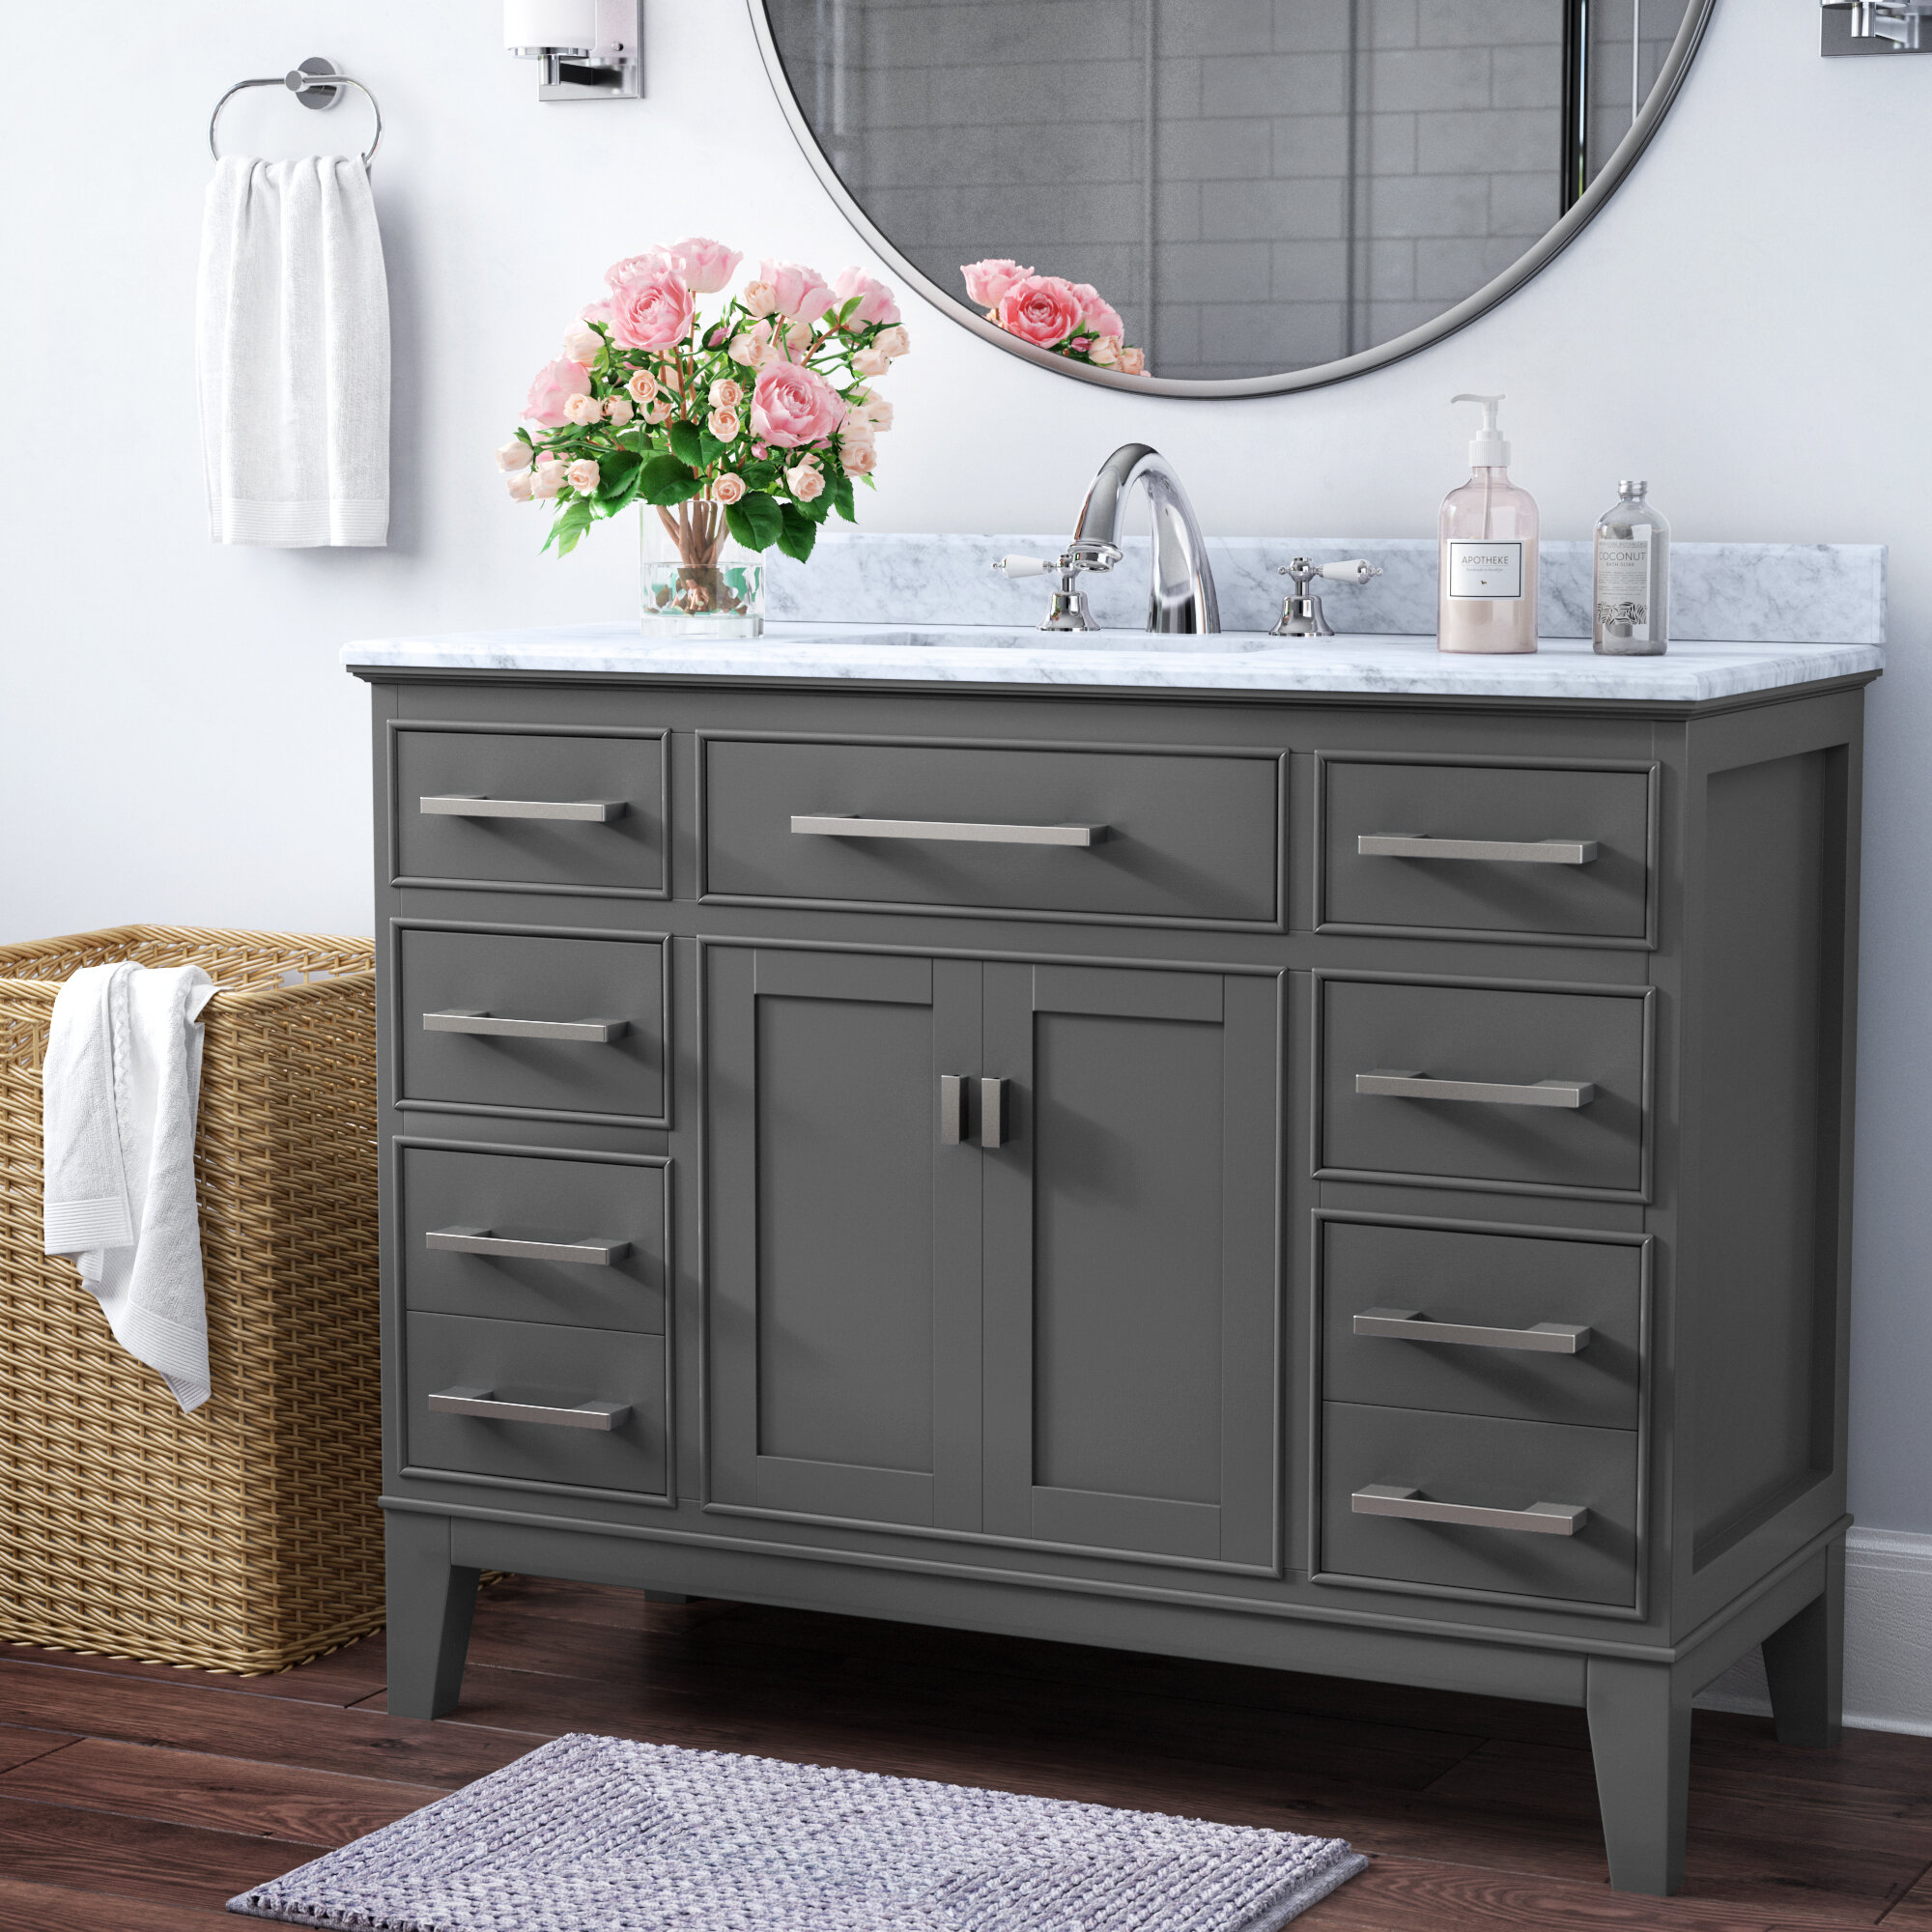 48 Inch Free Standing Bathroom Vanities You Ll Love In 2021 Wayfair